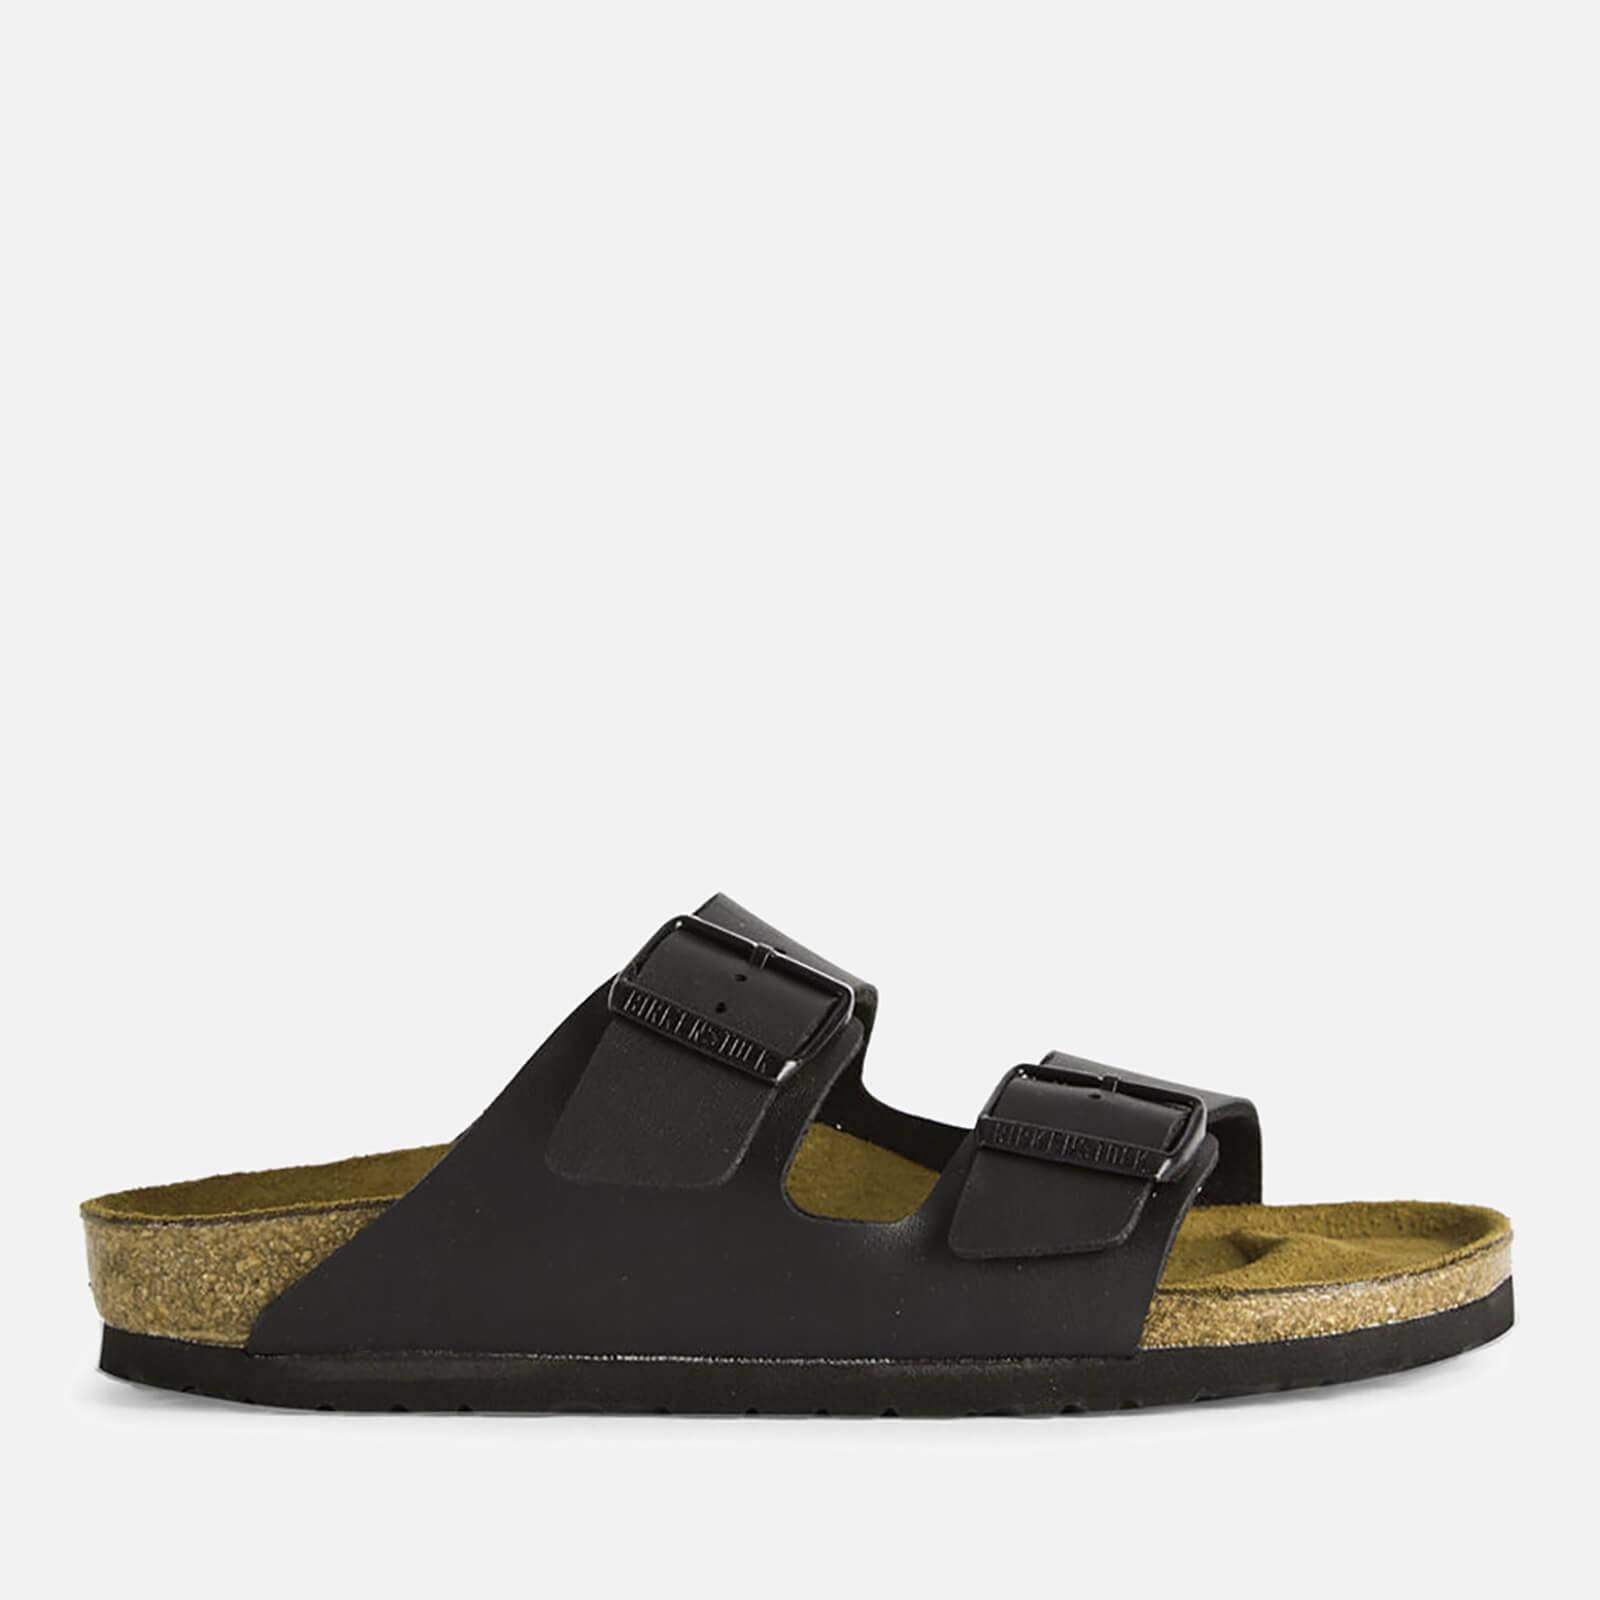 Birkenstock Women's Arizona Slim Fit Double Strap Sandals - Black - EU 38/UK 5